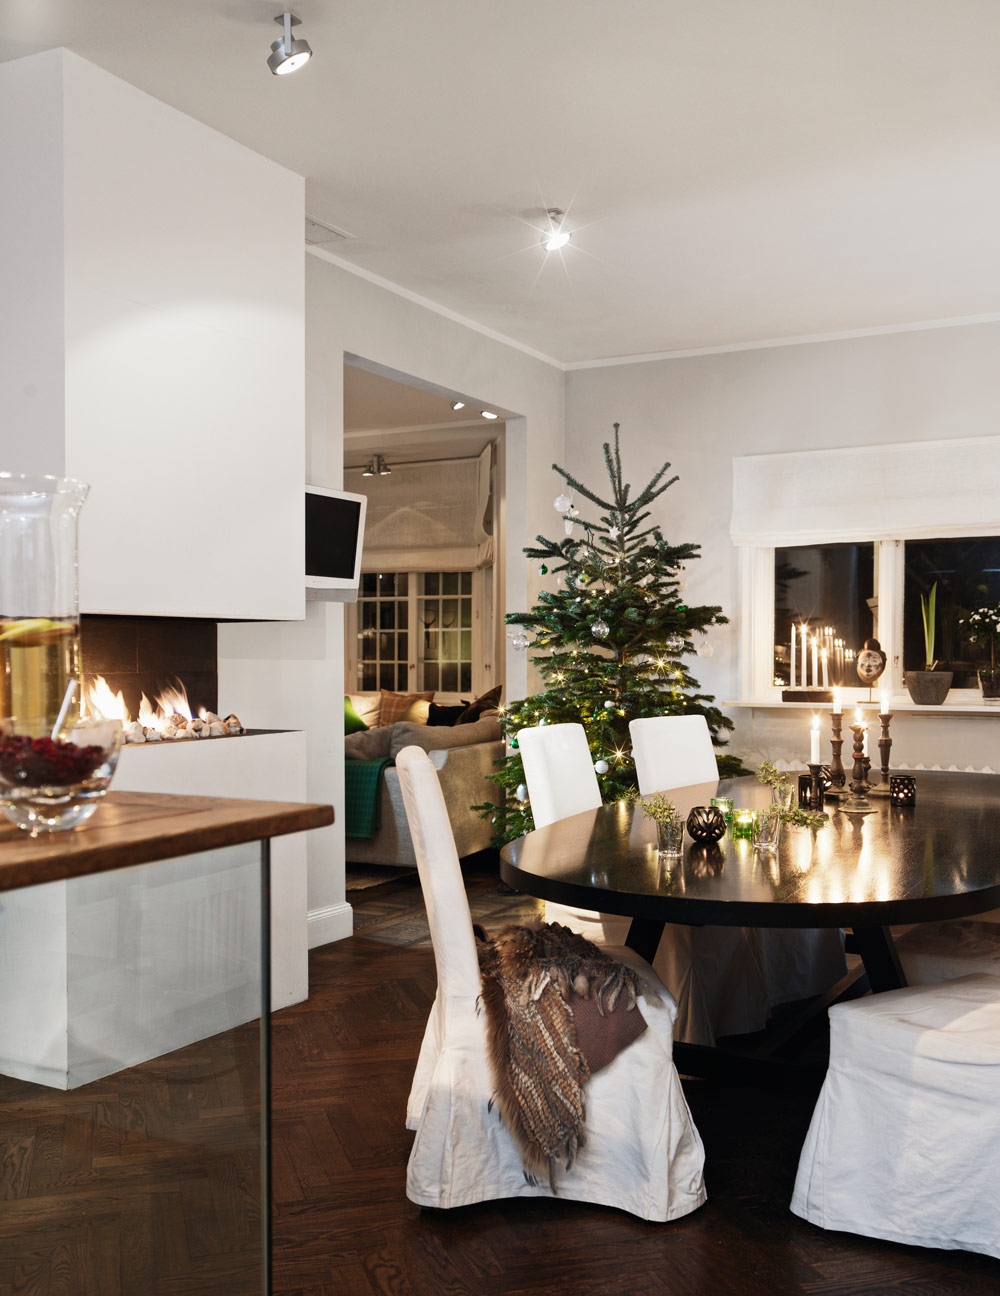 classic-swedish-scandinavian-nordic-style-kitchen-all-white-simple-minimalist-modern-christmas-decor-table-harringbone-parquet-oval-table-glass-kitchen-island